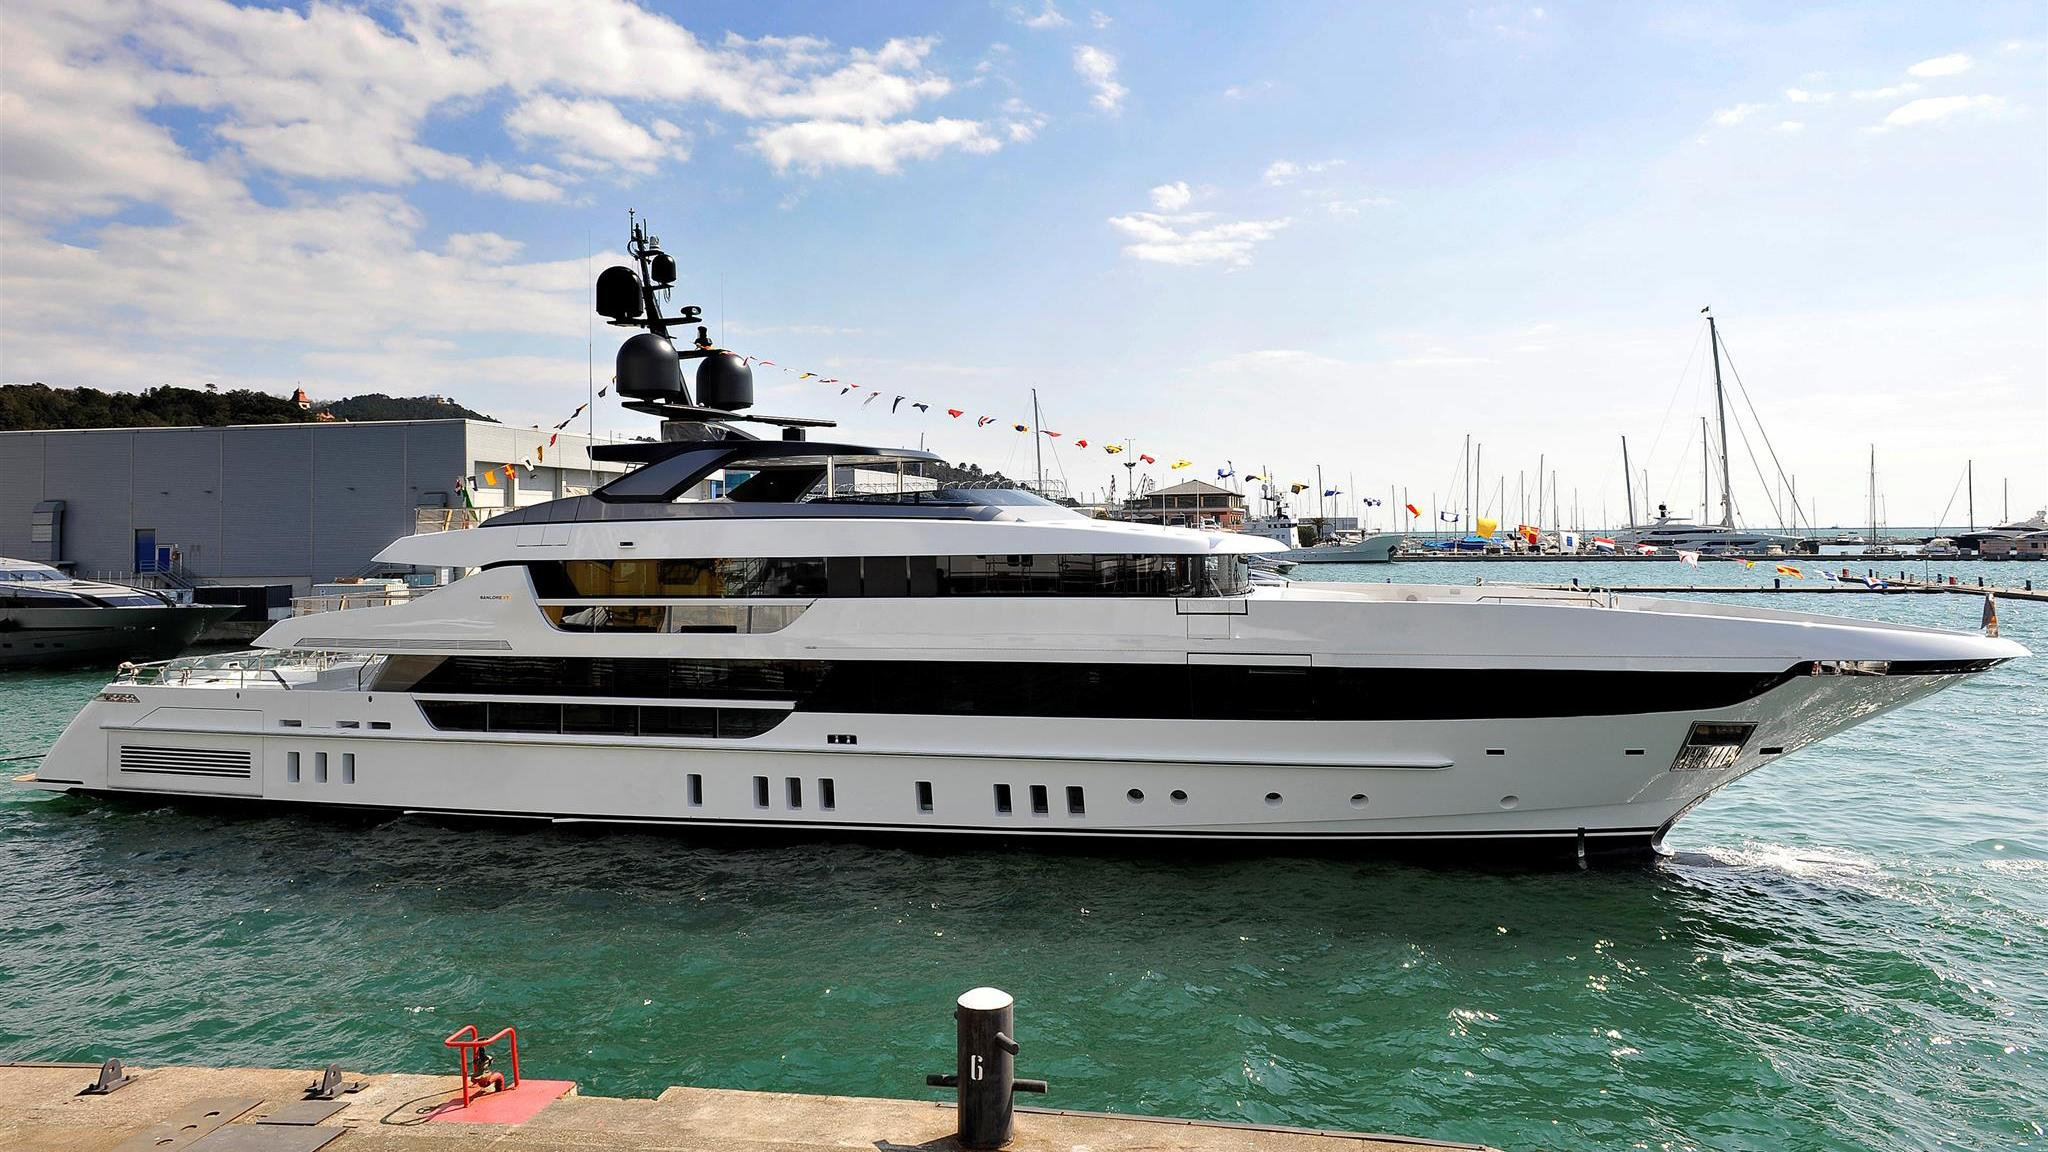 kd motoryacht sanlorenzo 52 steel 2018 52m launch profile